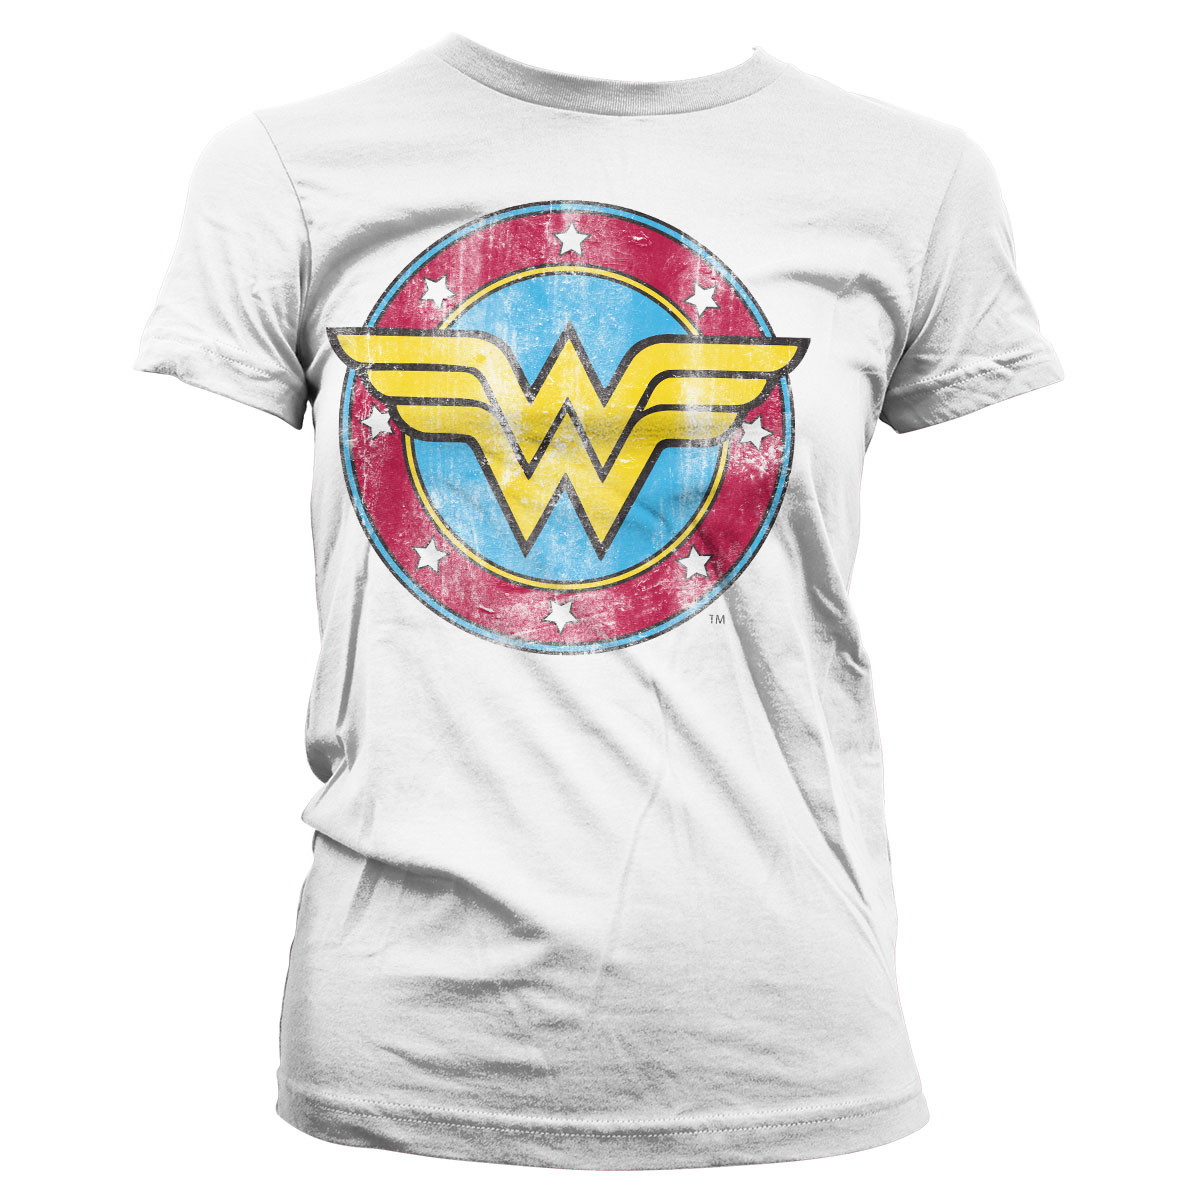 Wonder Woman Distressed Logo Girly Tee